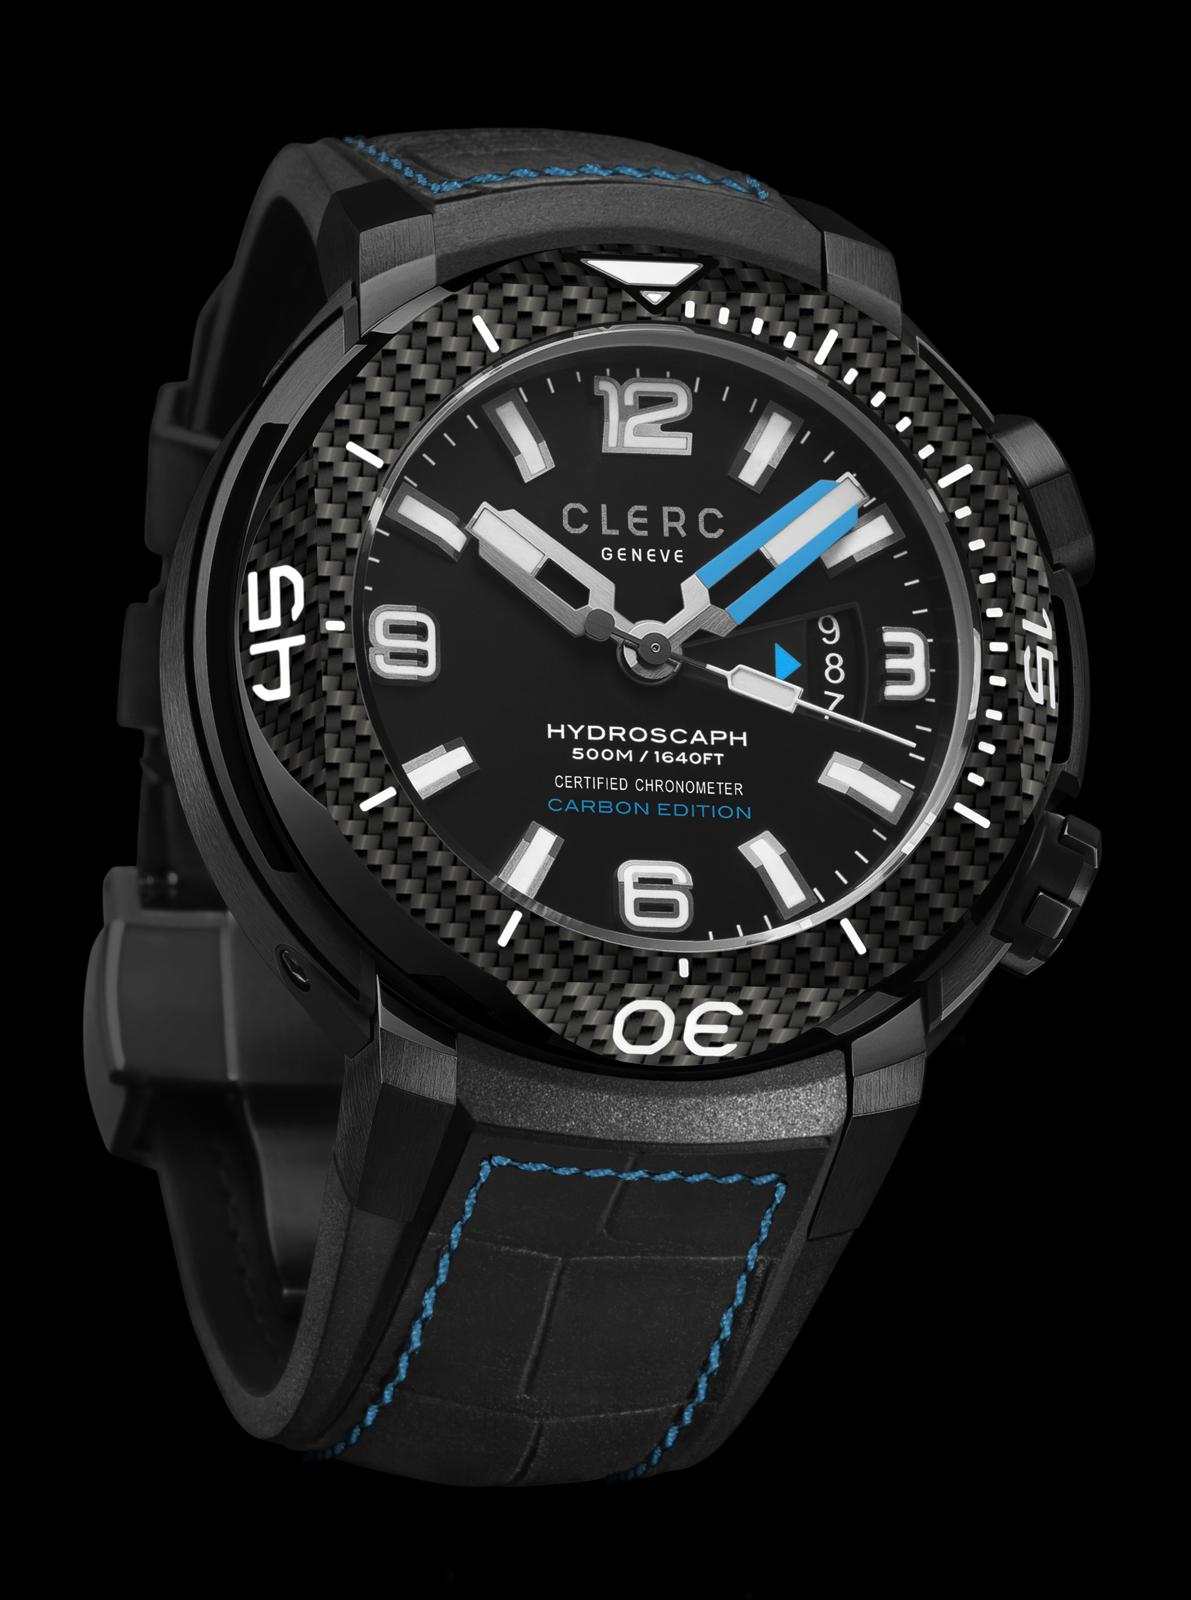 Clerc Hydroscaph H1 Chronometer Carbon Edition